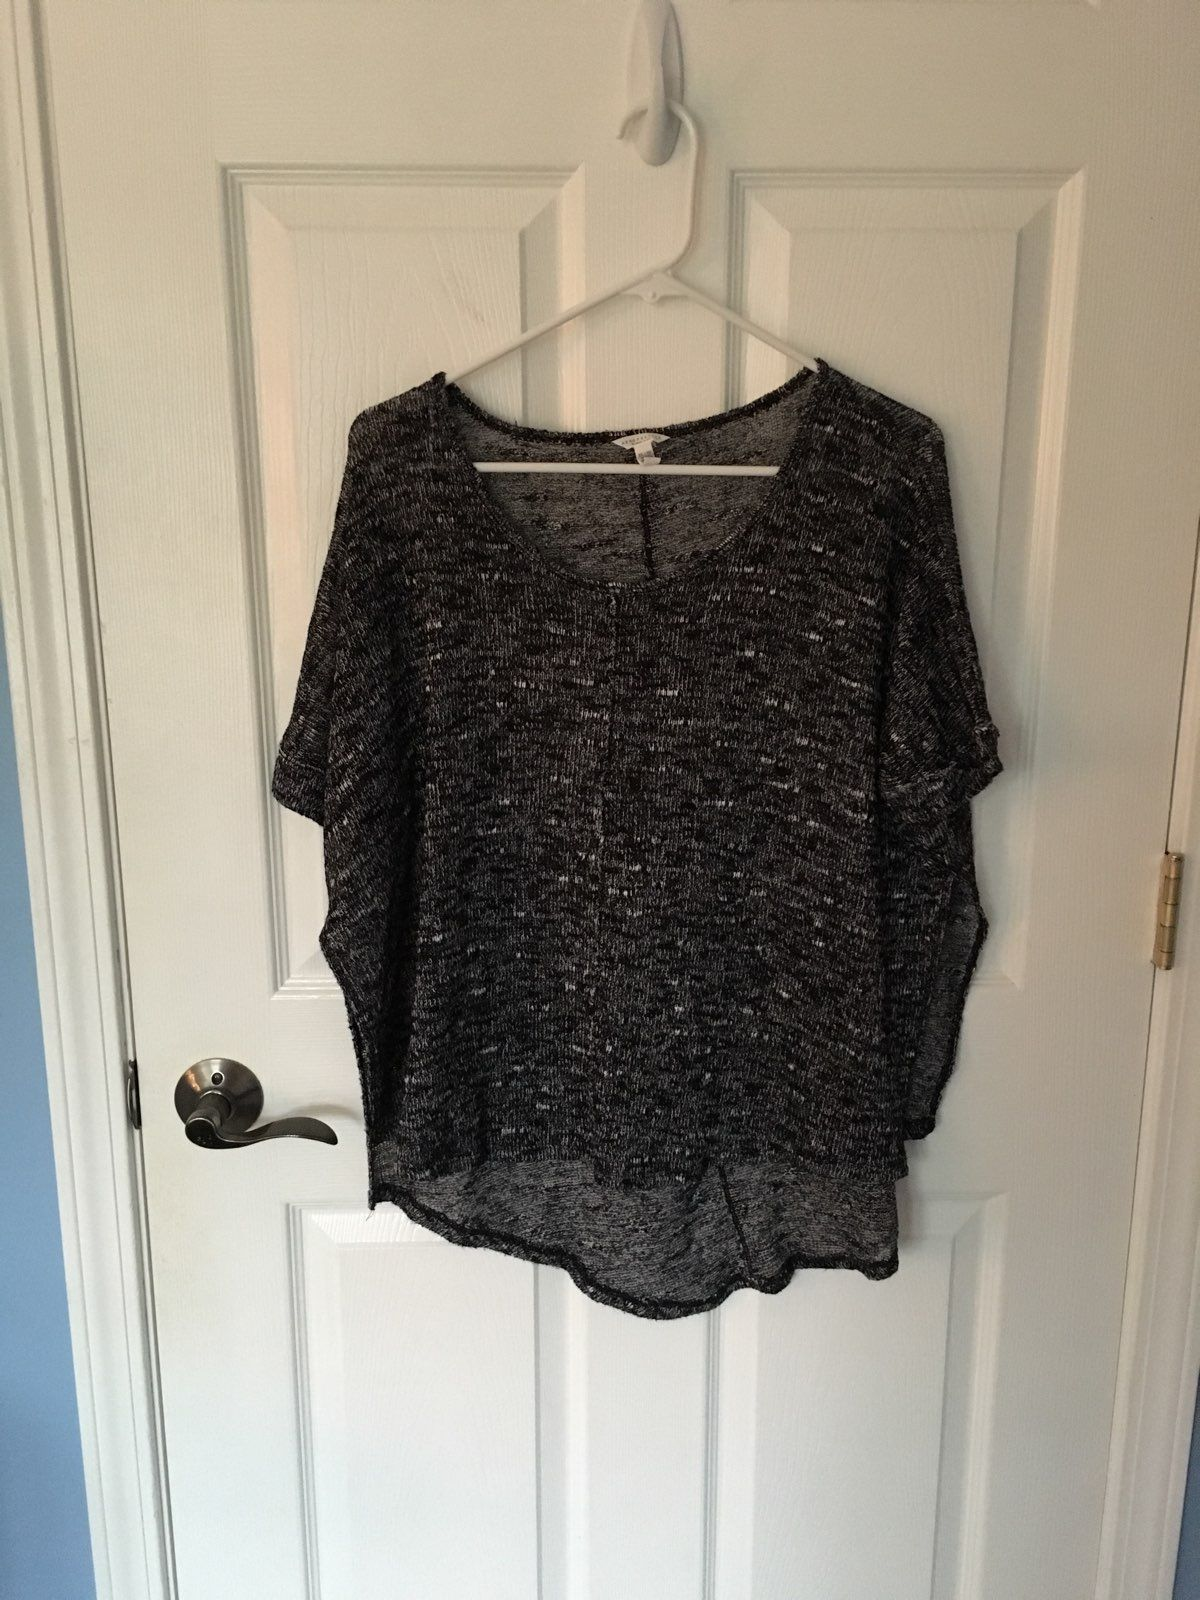 Flowy Black Sweater Top - Mercari: BUY & SELL THINGS YOU LOVE